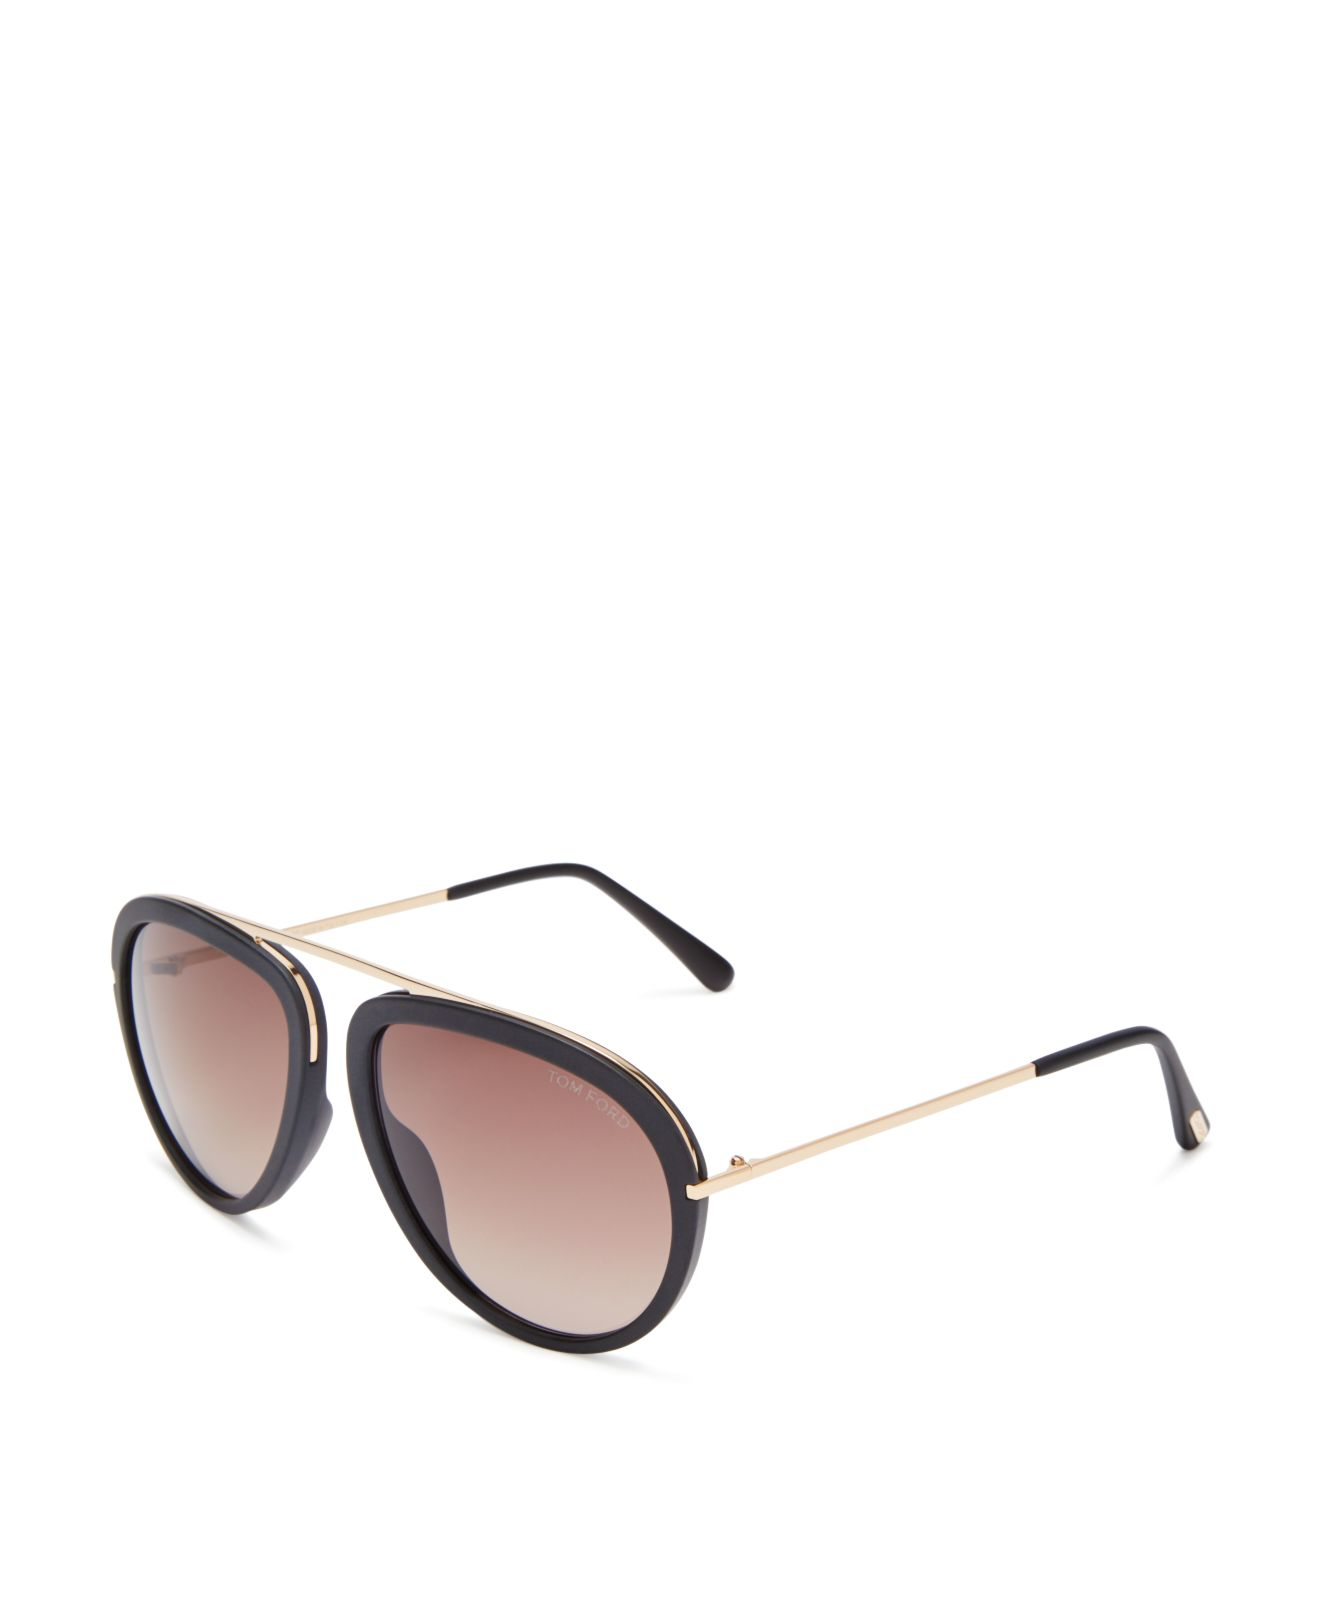 8aca7f70b1 Oakley Rose Gold Sunglasses